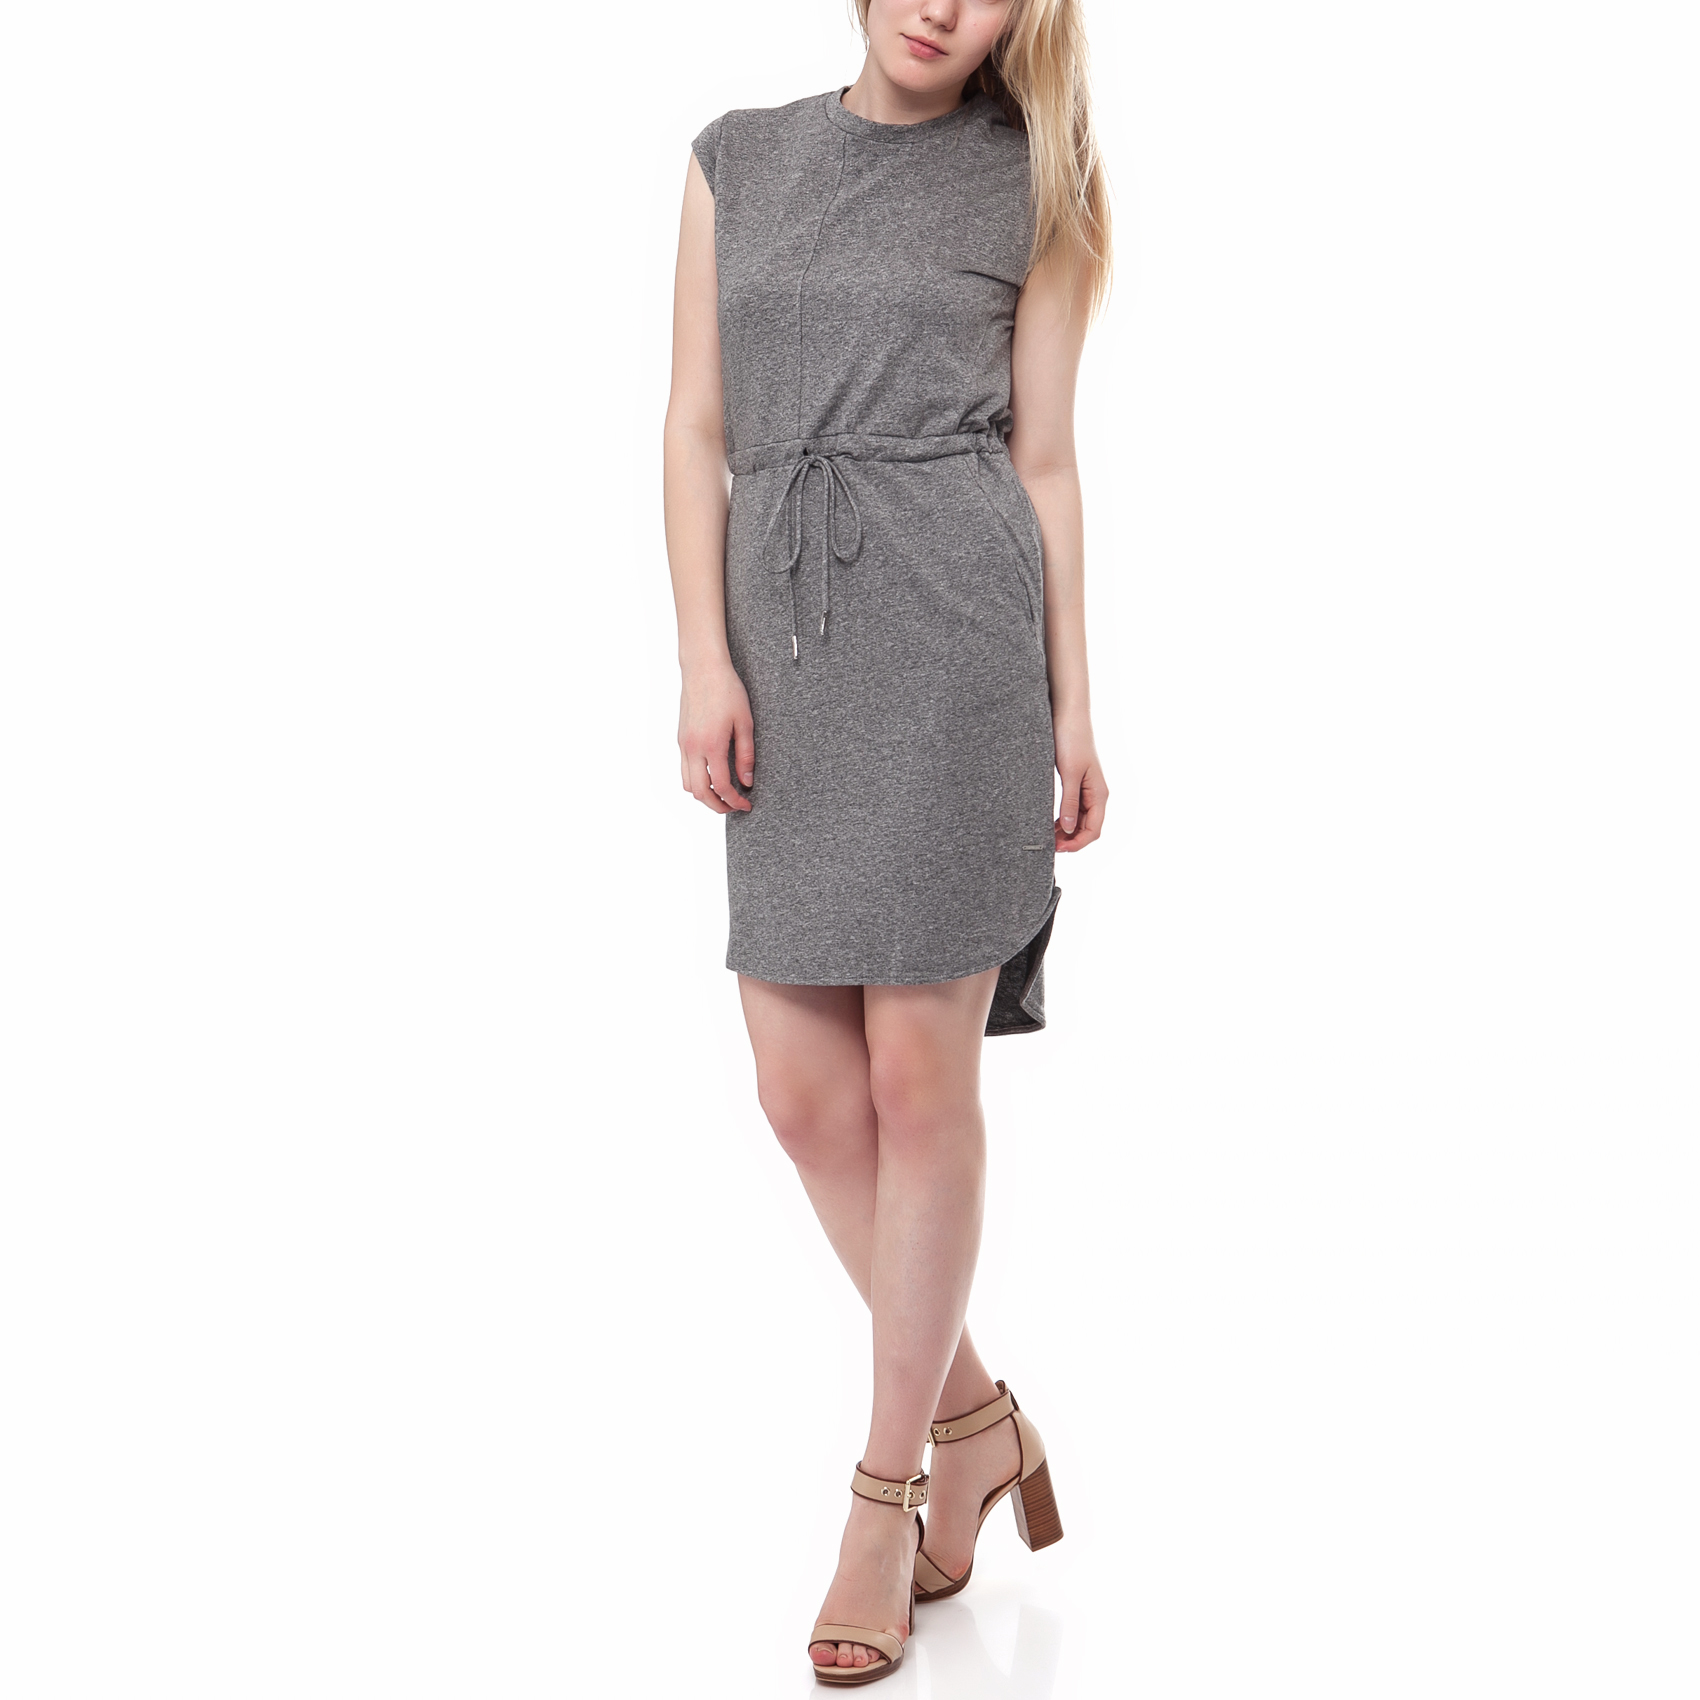 CALVIN KLEIN JEANS - Γυναικείο φόρεμα Calvin Klein Jeans γκρι γυναικεία ρούχα φορέματα μίνι